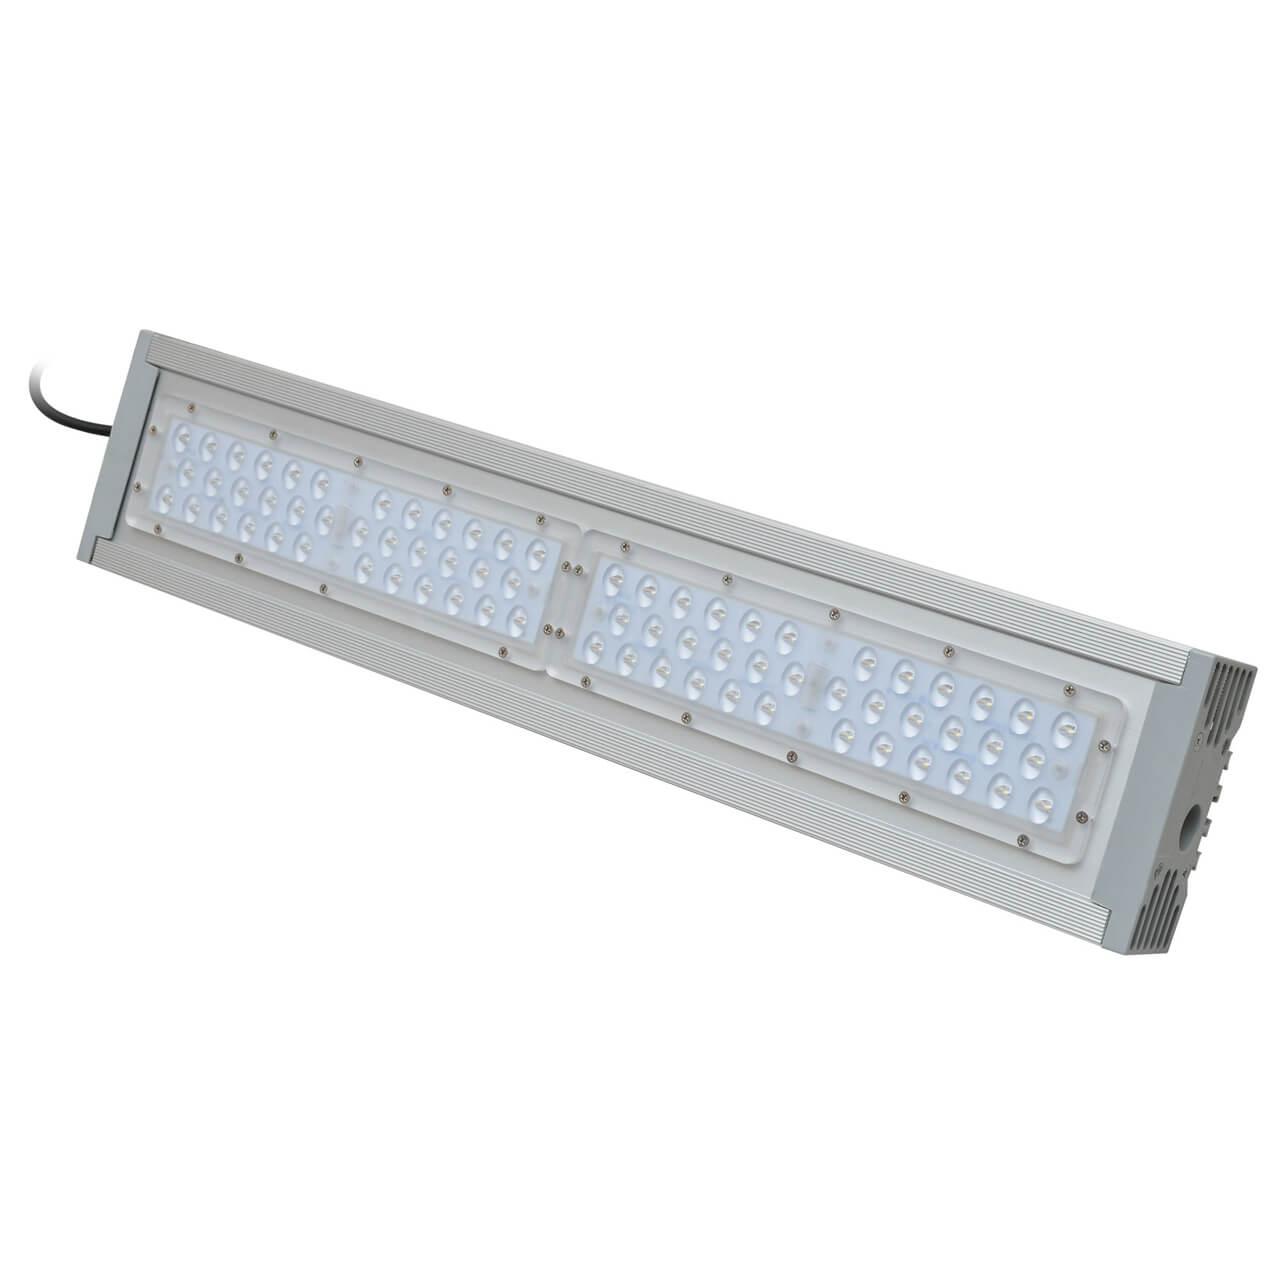 Светильник Uniel ULV-R24J 100W/6500К IP65 Silver ULV-R уличный светодиодный светильник ul 00003301 uniel ulg r001 020 rgb ip65 ball